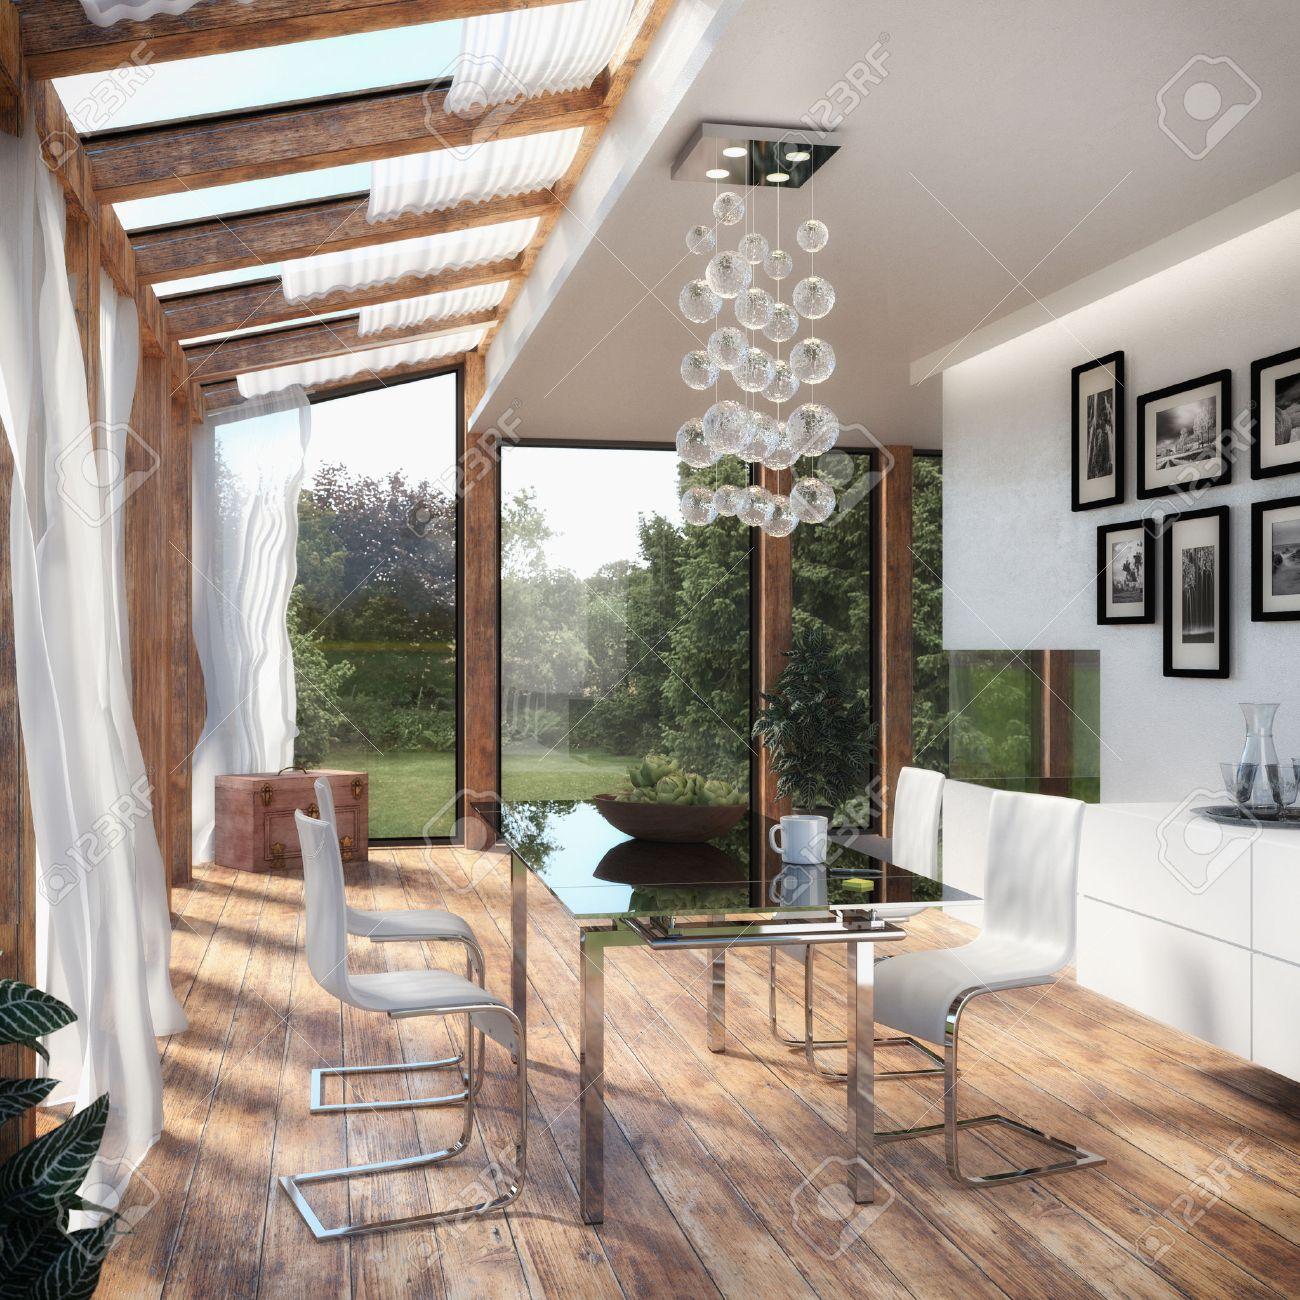 Modern Dining Room - Winter Garden Standard-Bild - 29945658